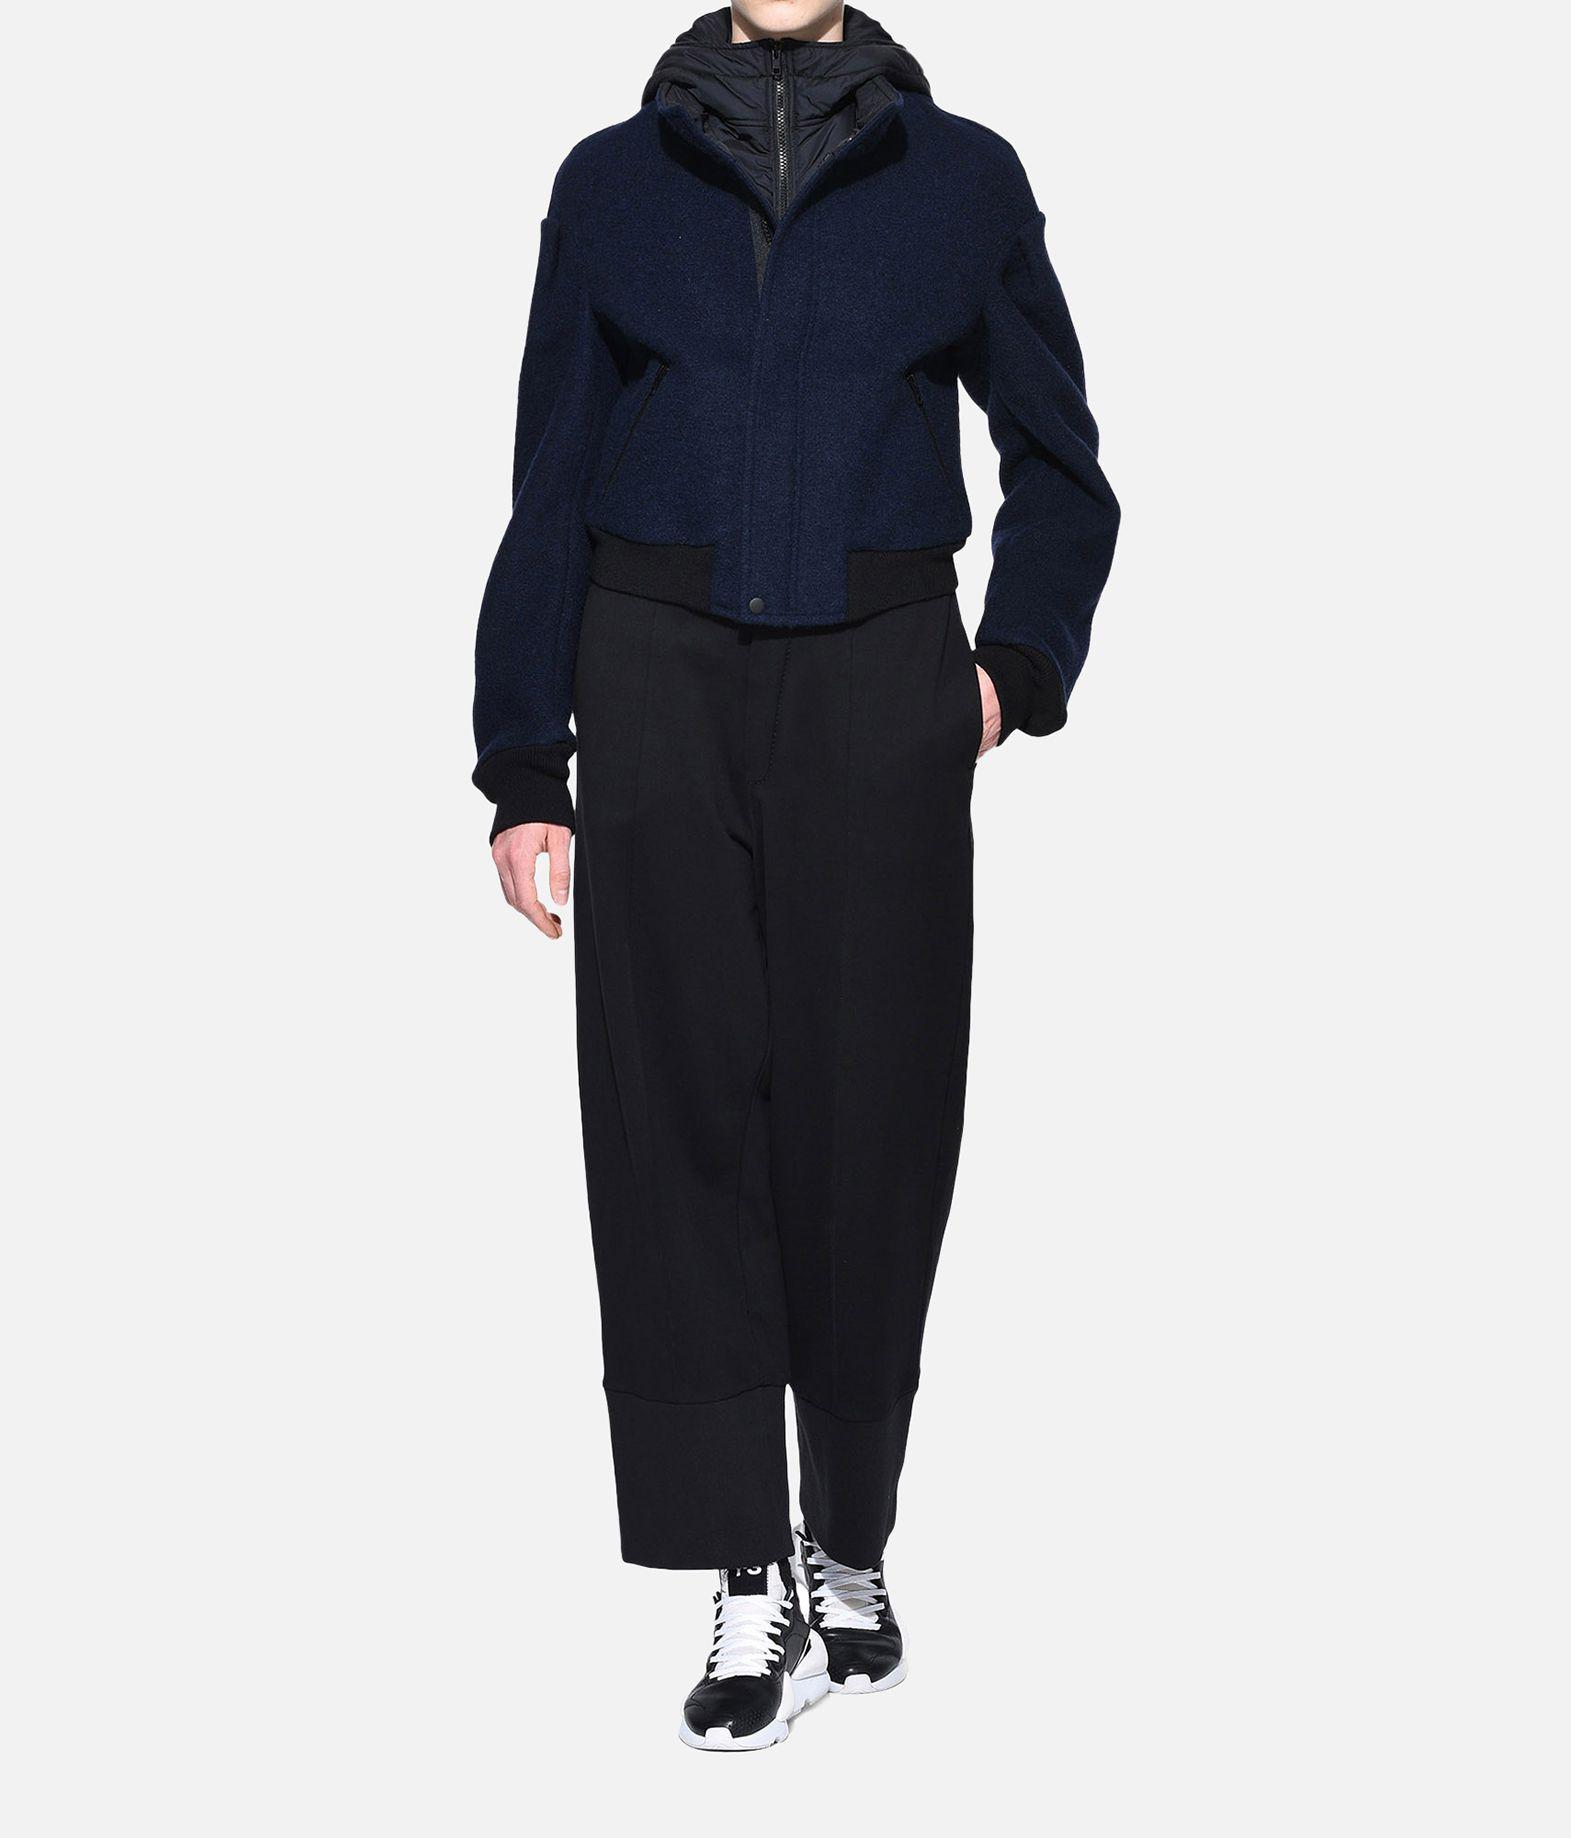 Y-3 Y-3 Wool Hoodie Jacket Giubbotto Donna a